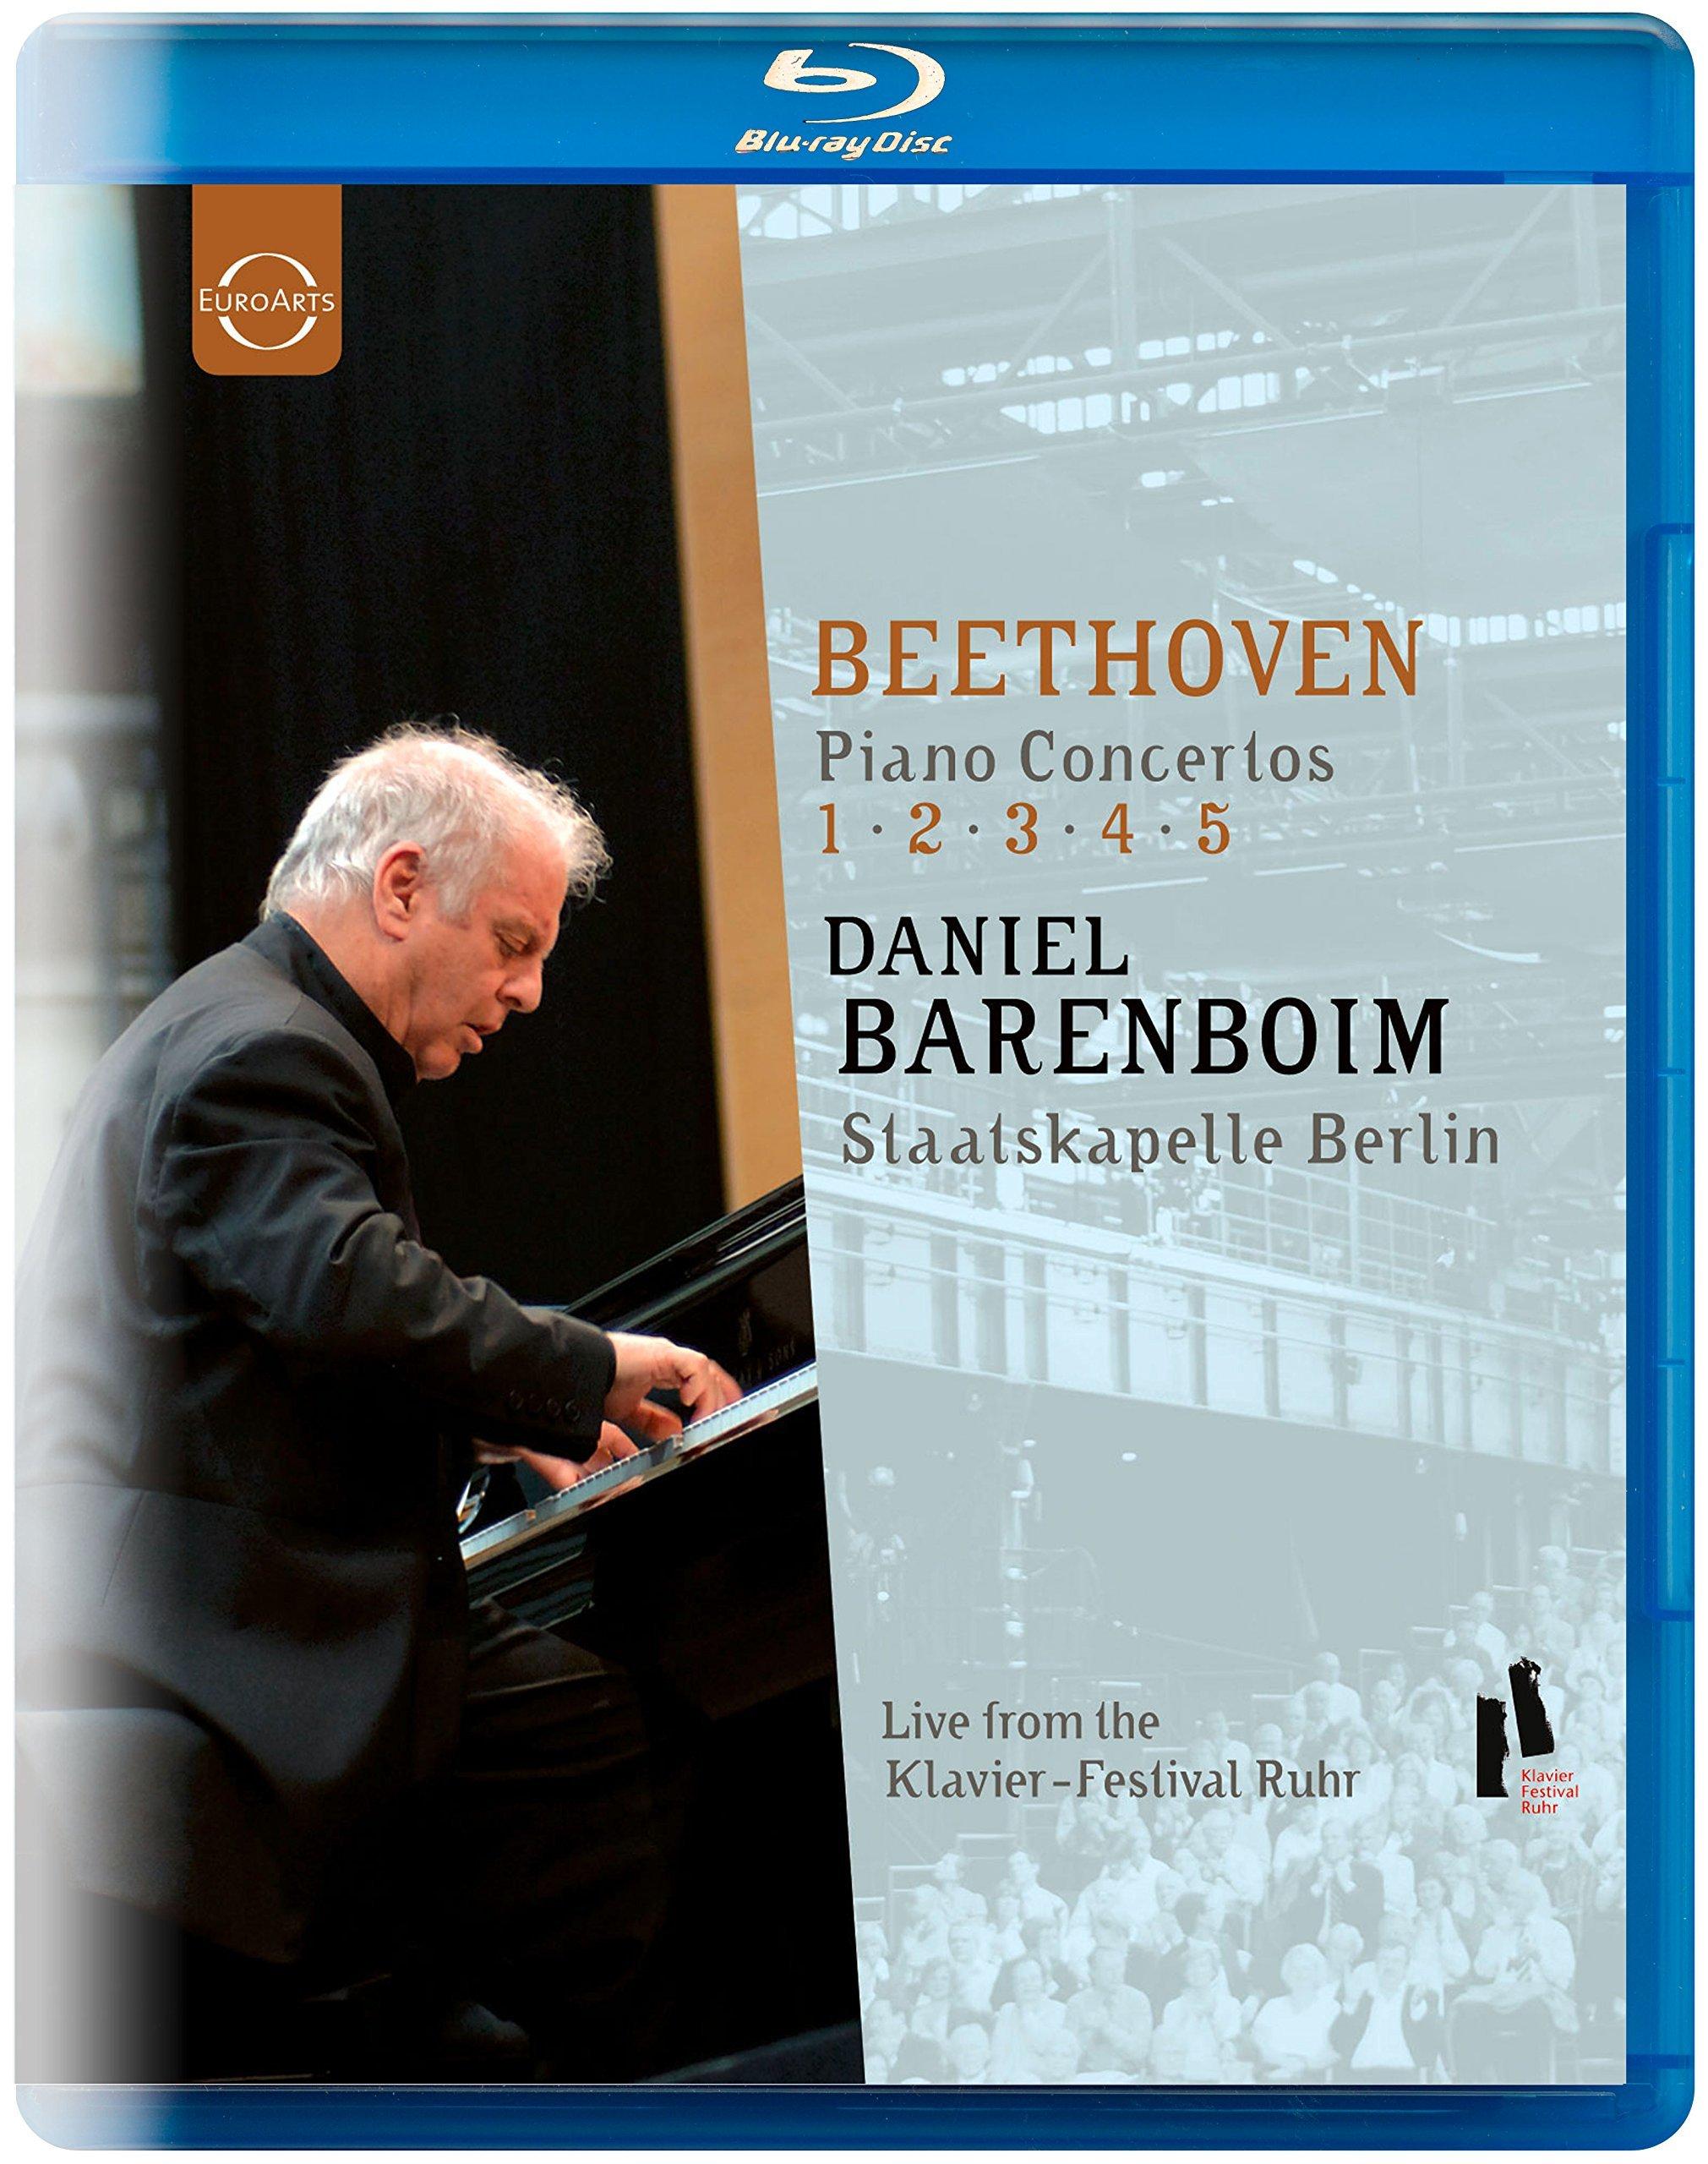 Blu-ray : STAATSKAPELLE BERLIN, DANIEL BARENBOIM - Piano Concertos 1-5 (Blu-ray)